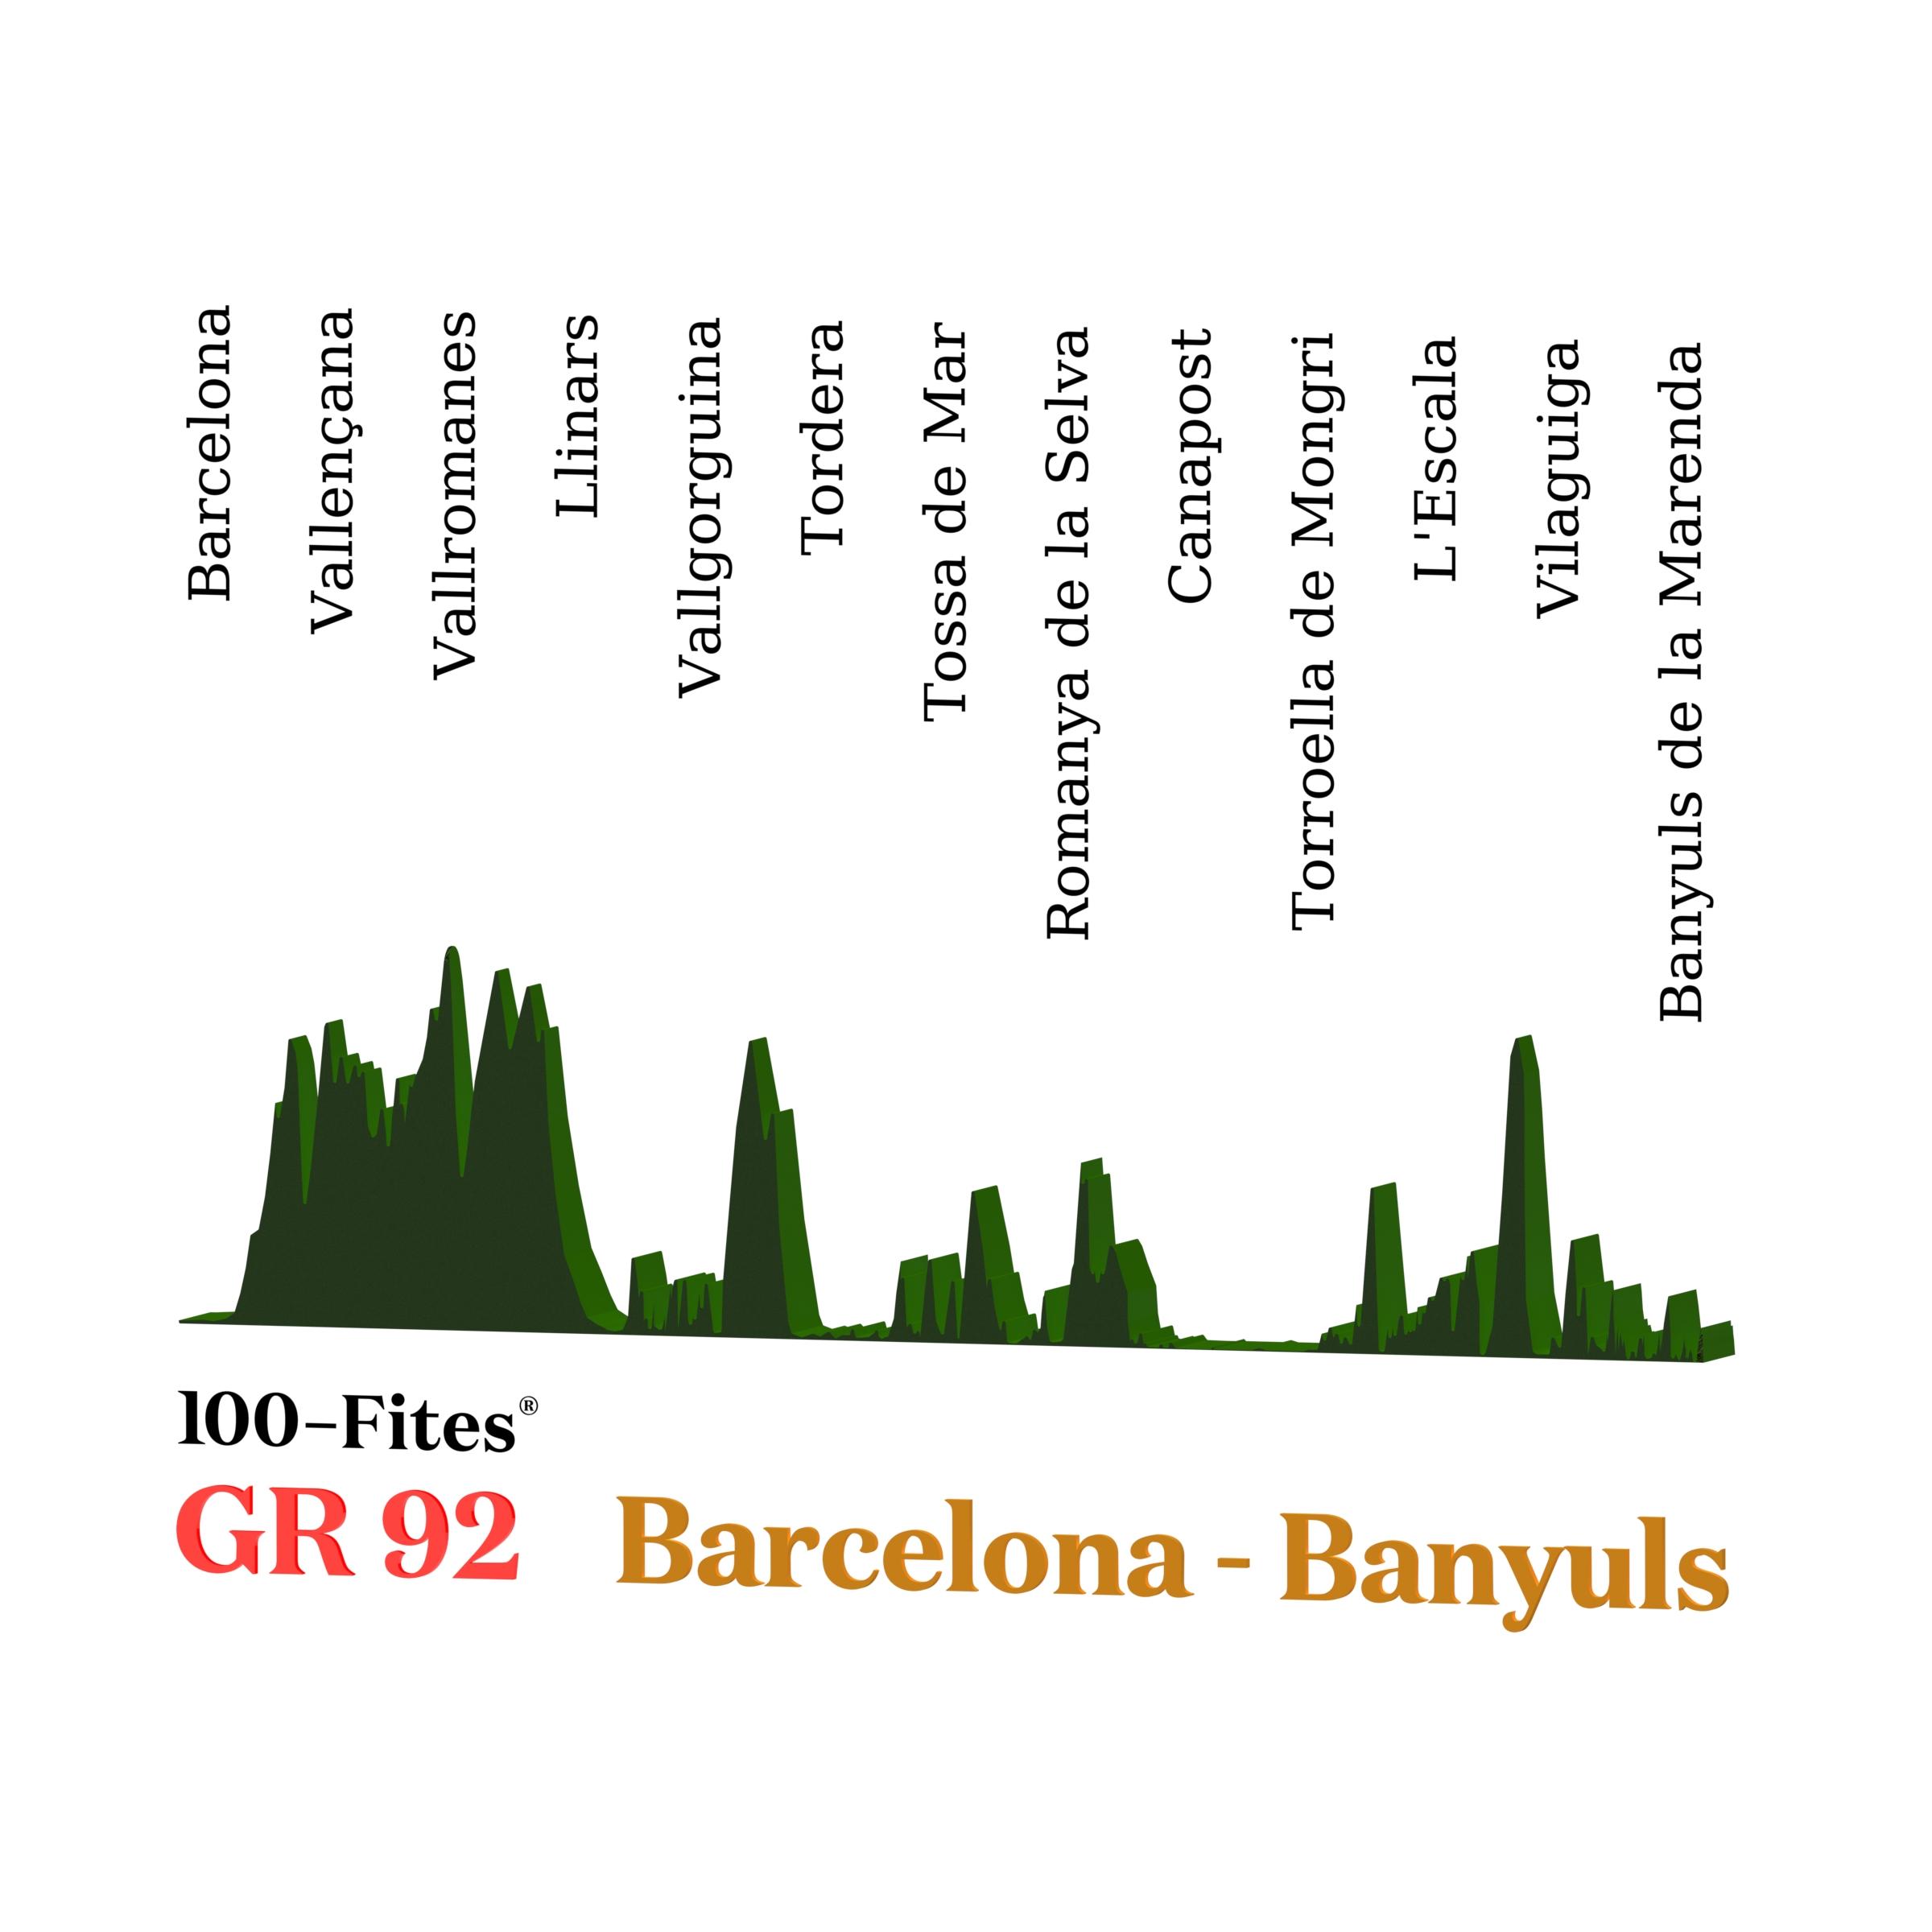 GR-92 BRCELONA - BANYULS